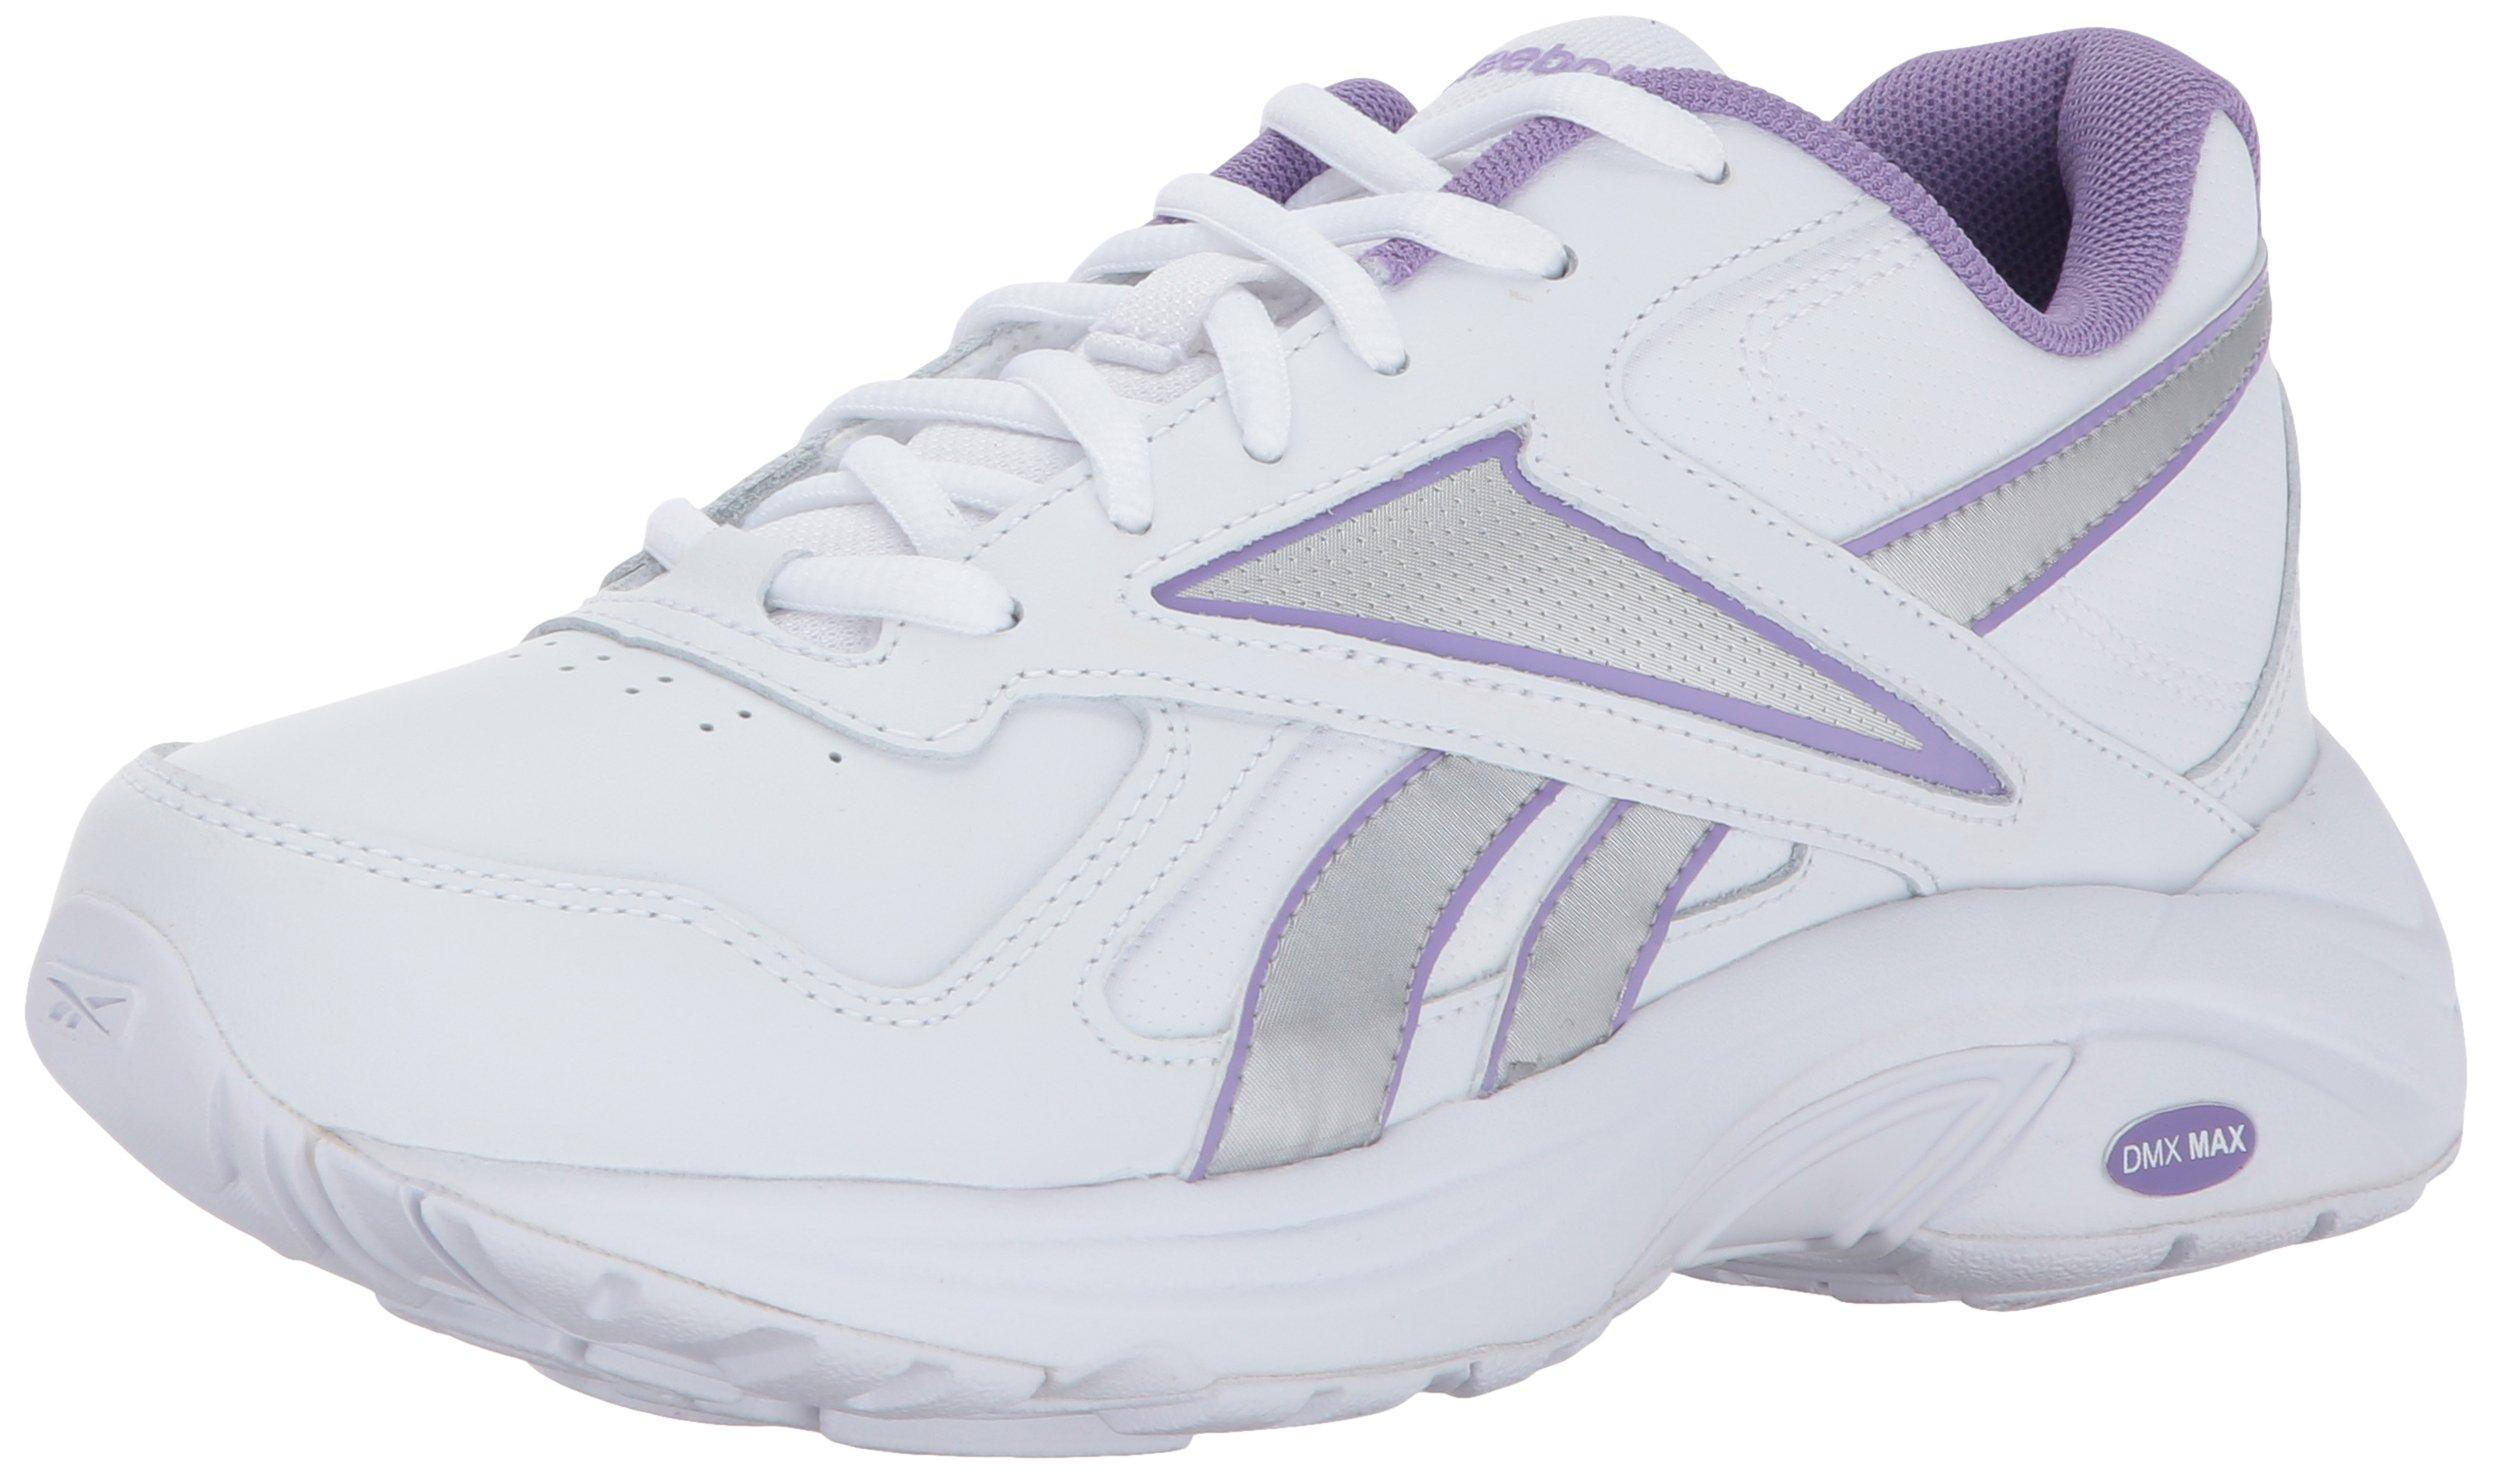 Reebok Women's Walk Ultra V DMX Max Track Shoe, White/Smoky Violet/Silver Metallic, 7.5 M US